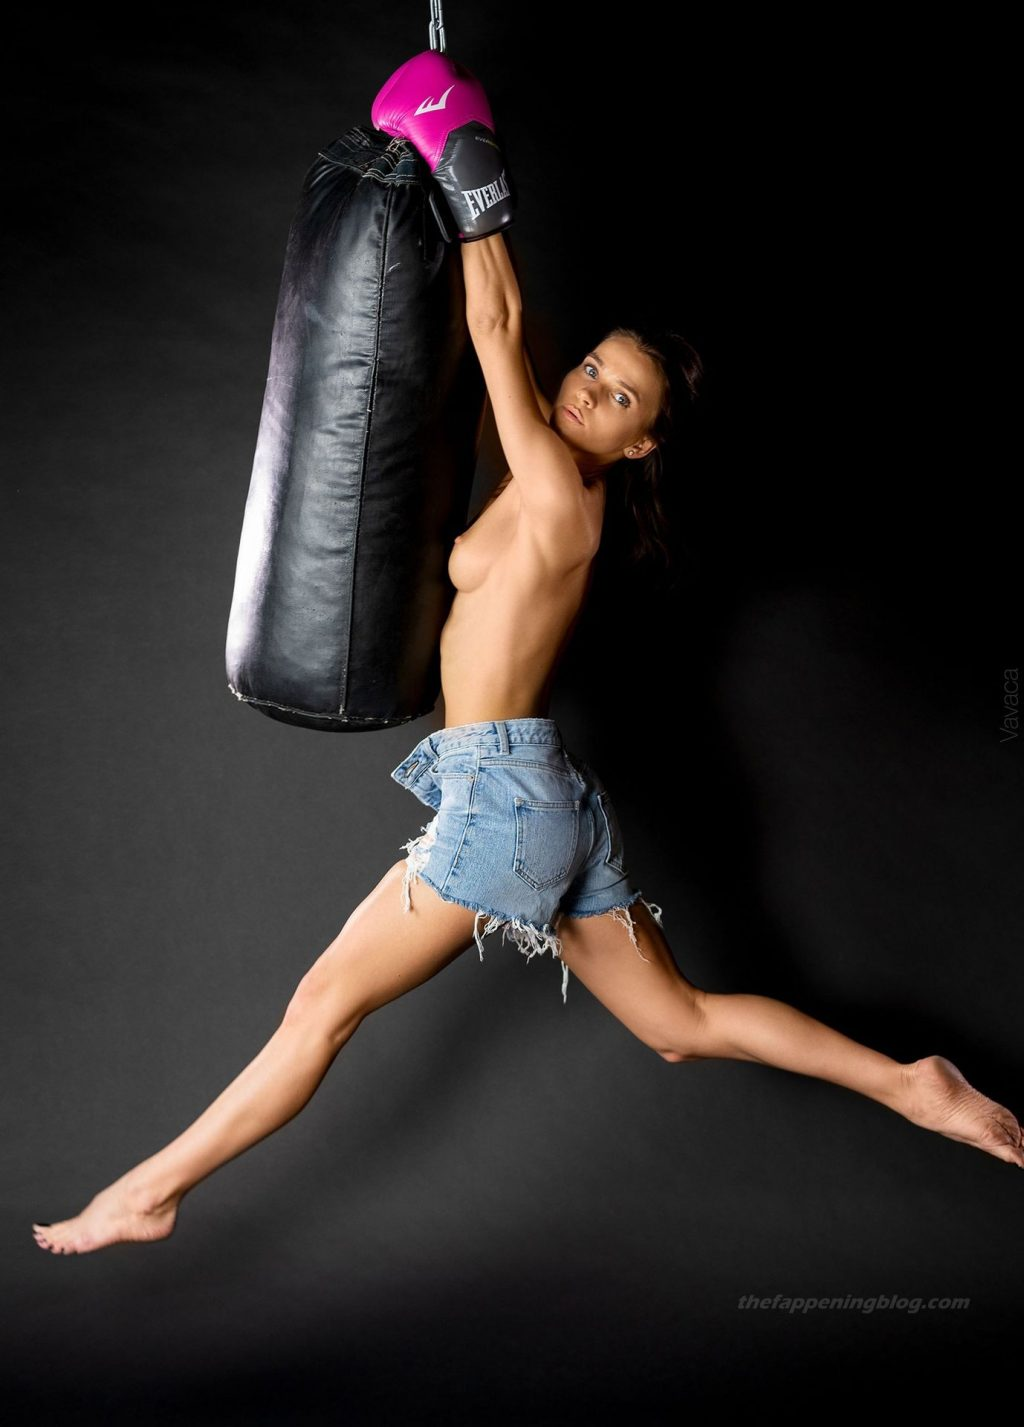 Kristina Makarova Nude (11 New Photos)